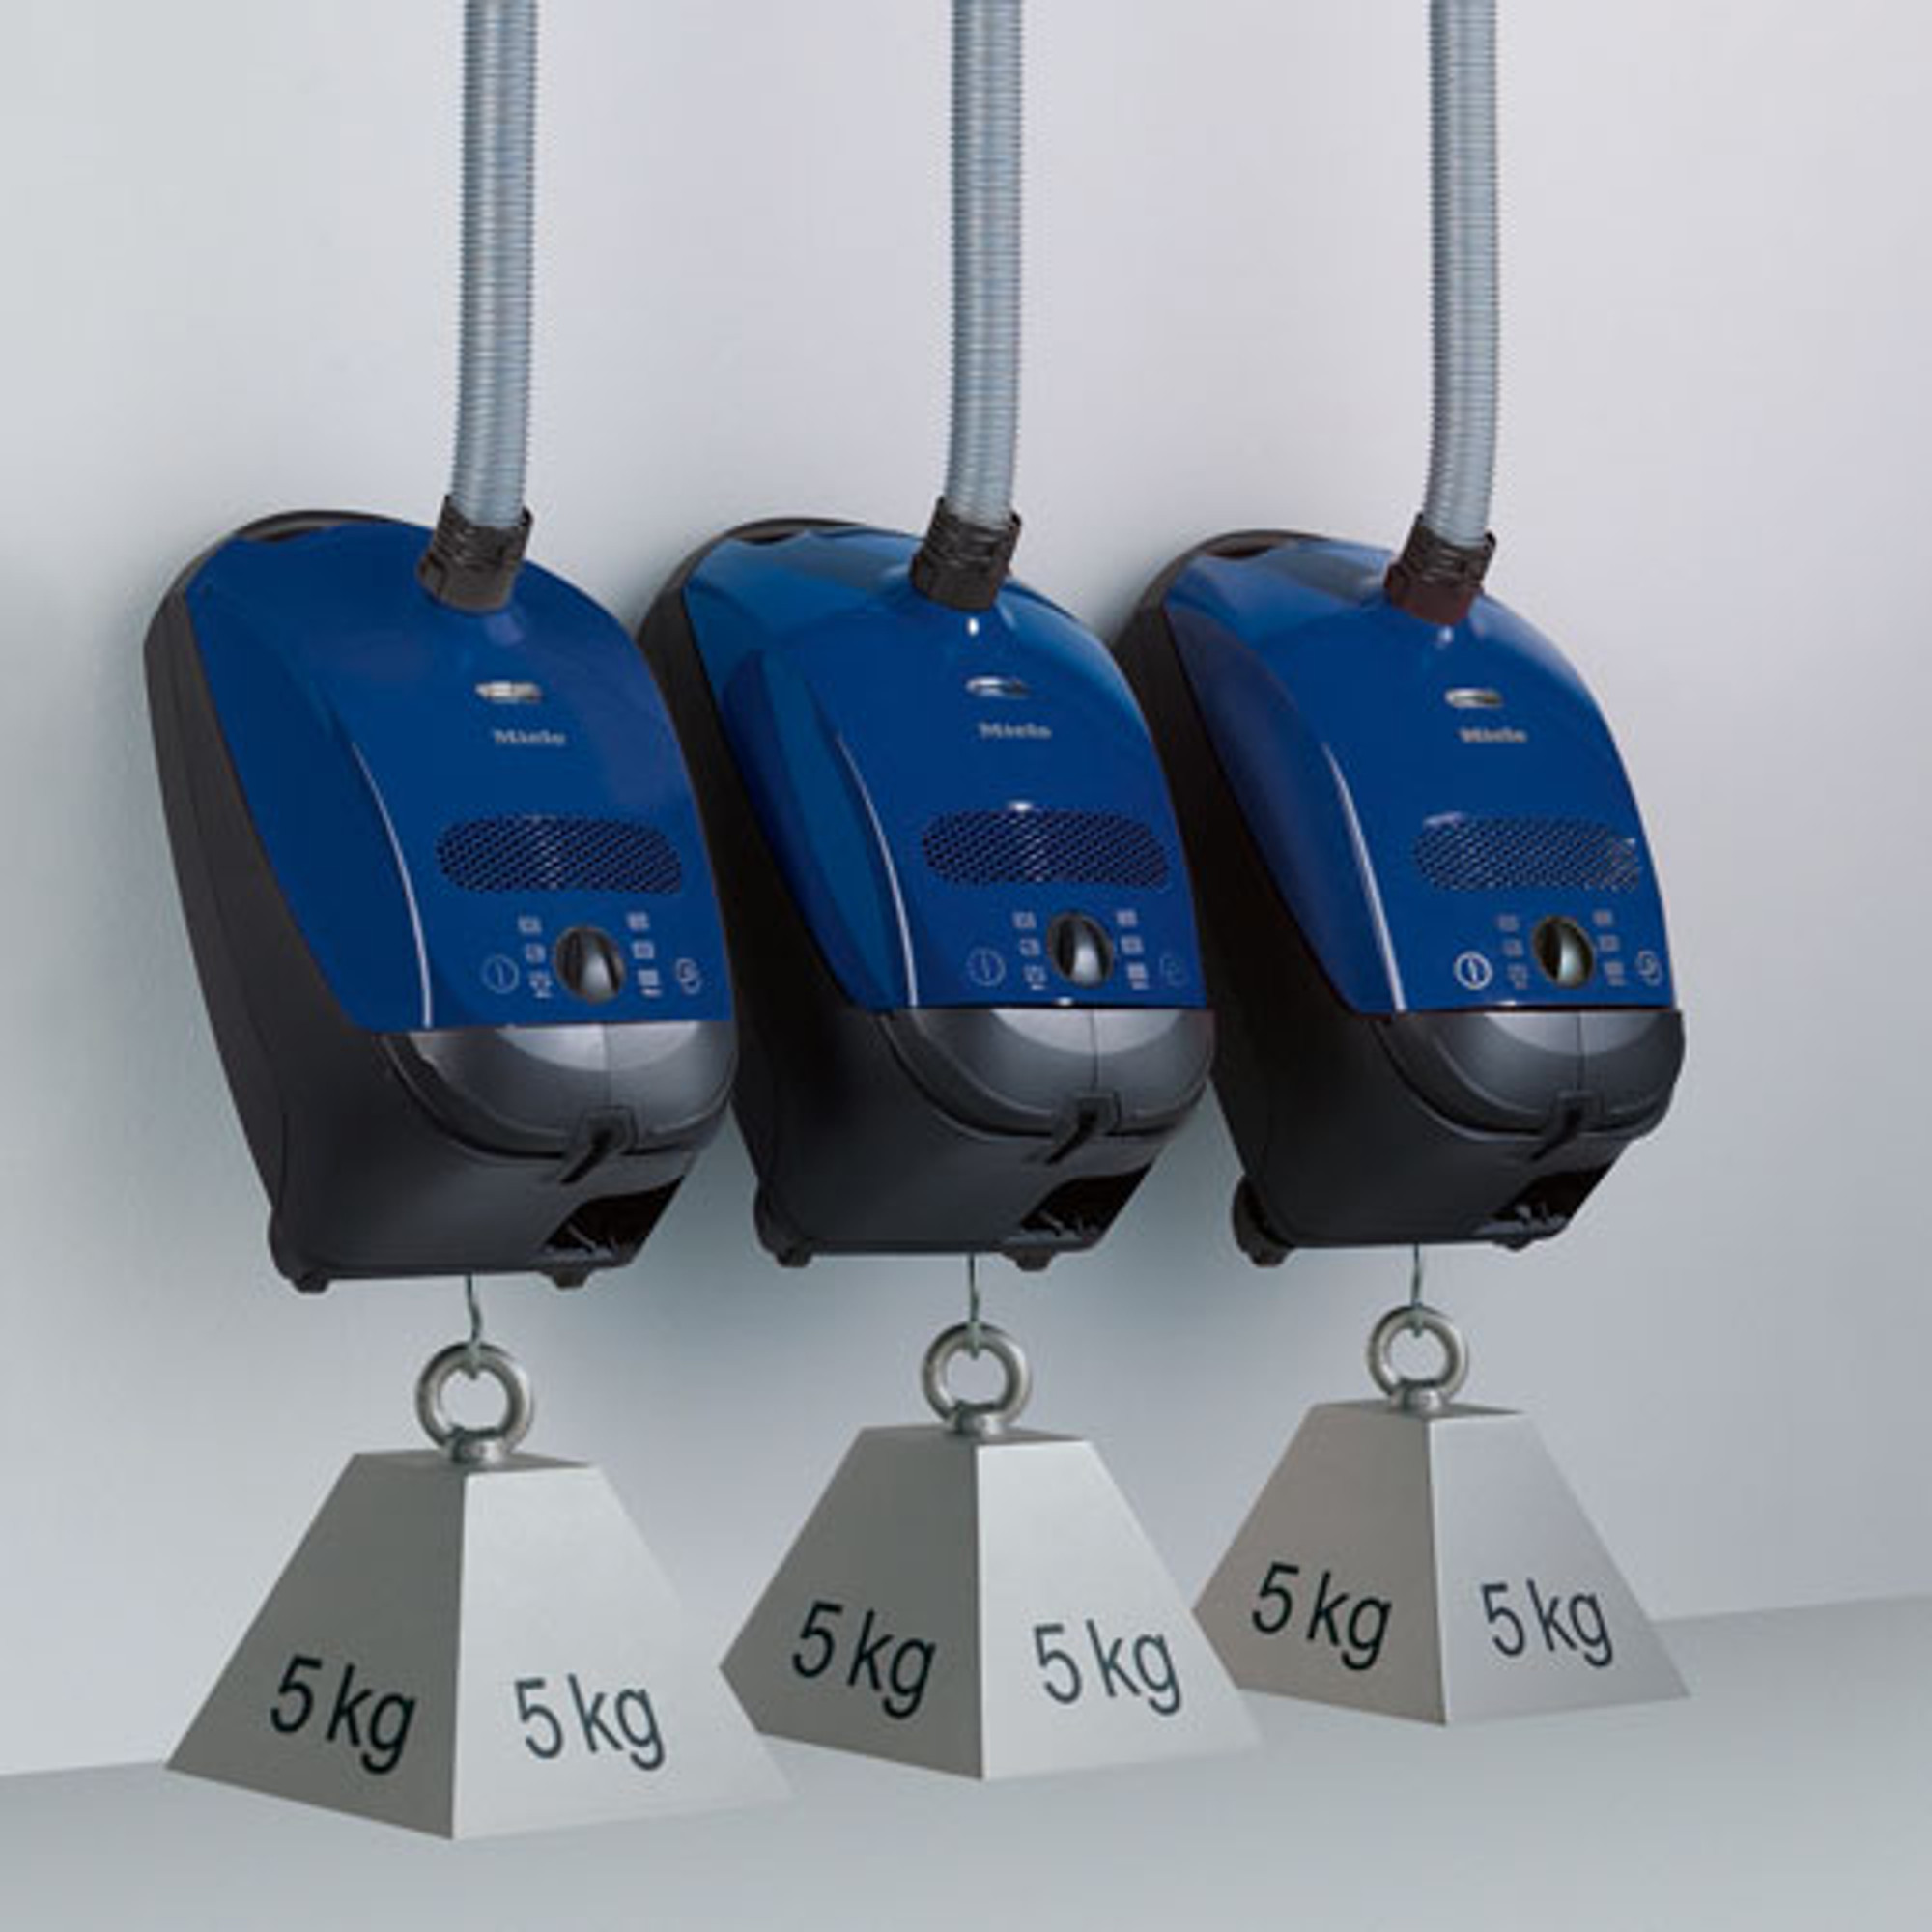 Buy Miele Classic C1 Hardfloor Vacuum Cleaner From Canada